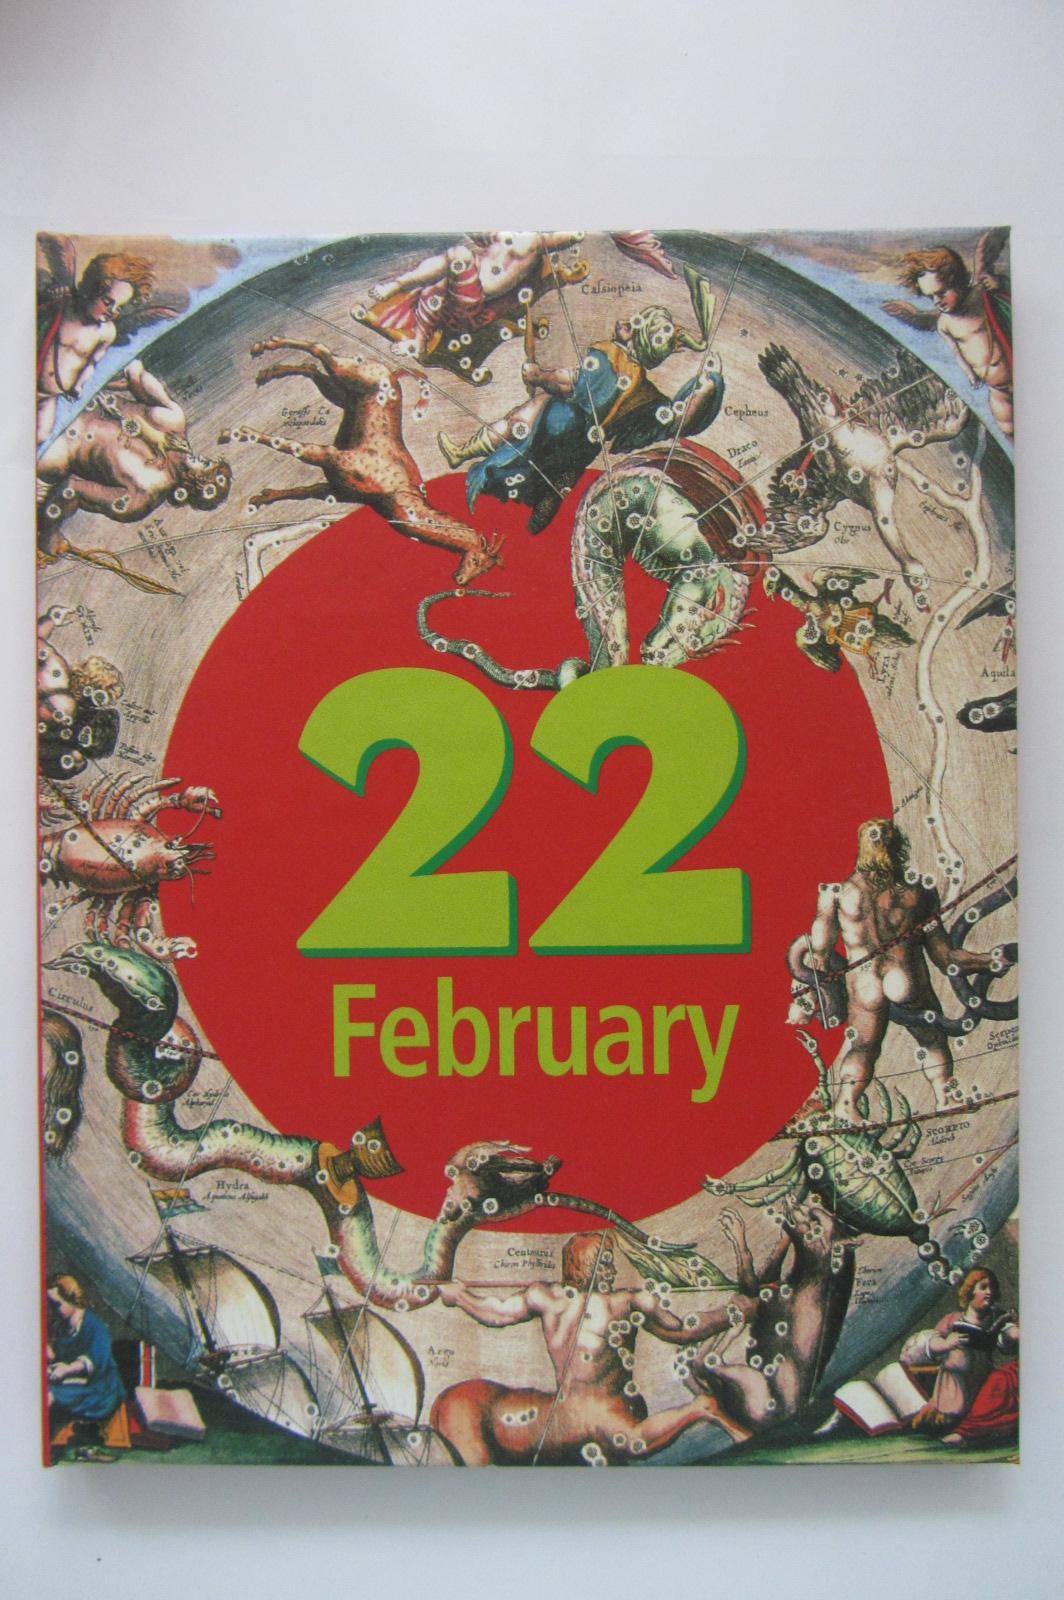 FEBRUARY-BIRTHDAY-BOOK-ANY-DATE-PRESENT-GIFT-UNUSUAL-1st-29TH-CHRISTMAS-HARDBACK